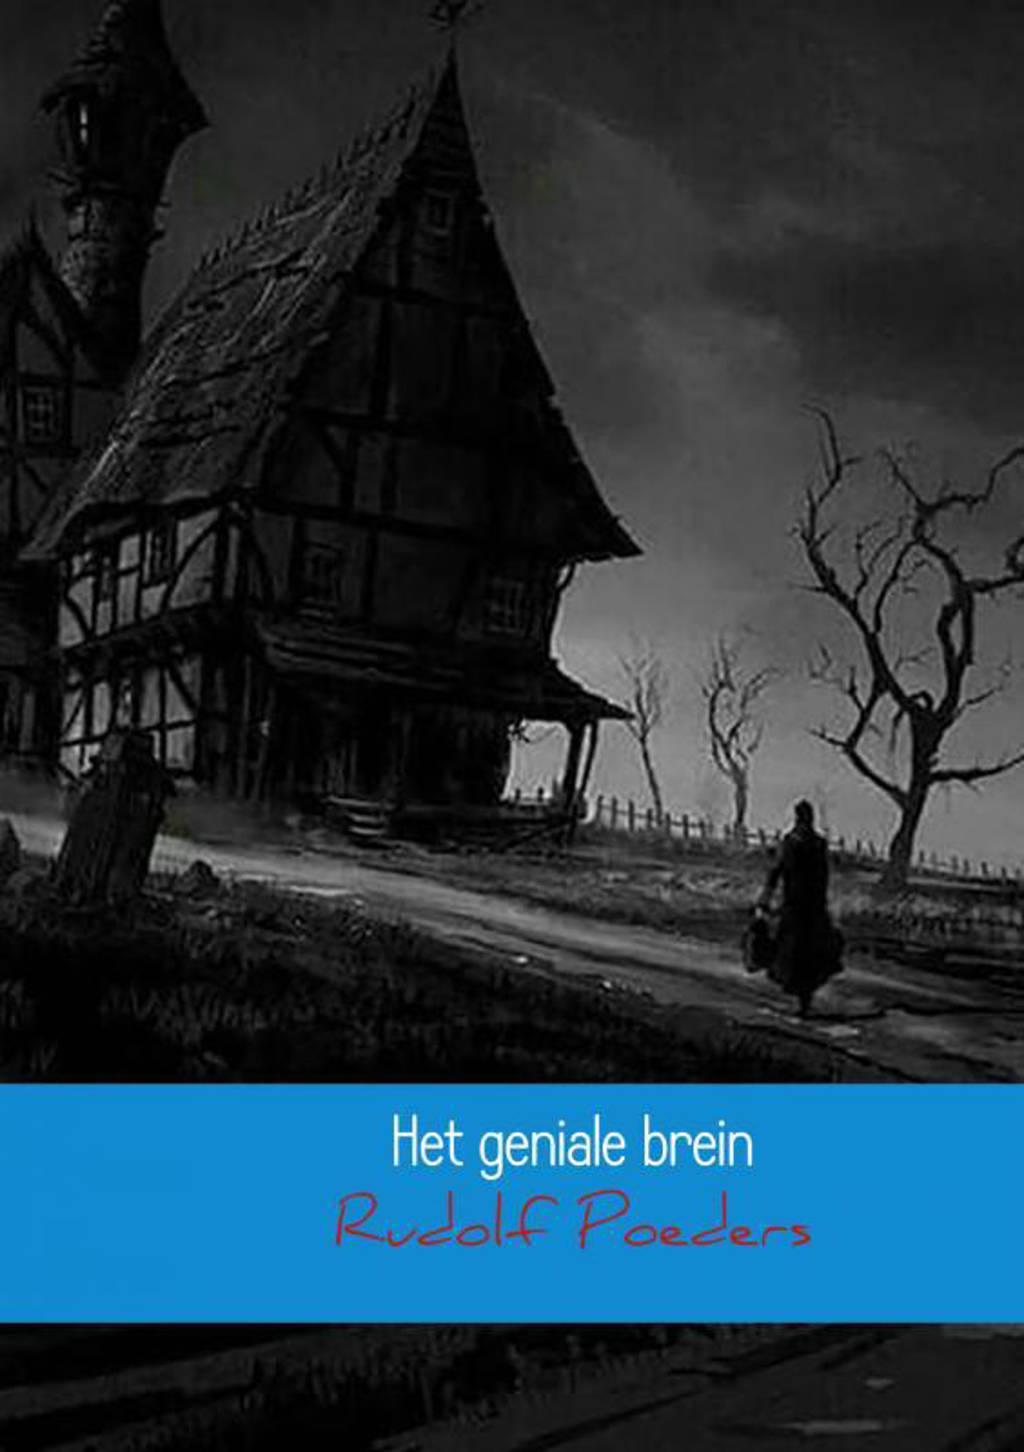 Het geniale brein - Rudolf Poeders